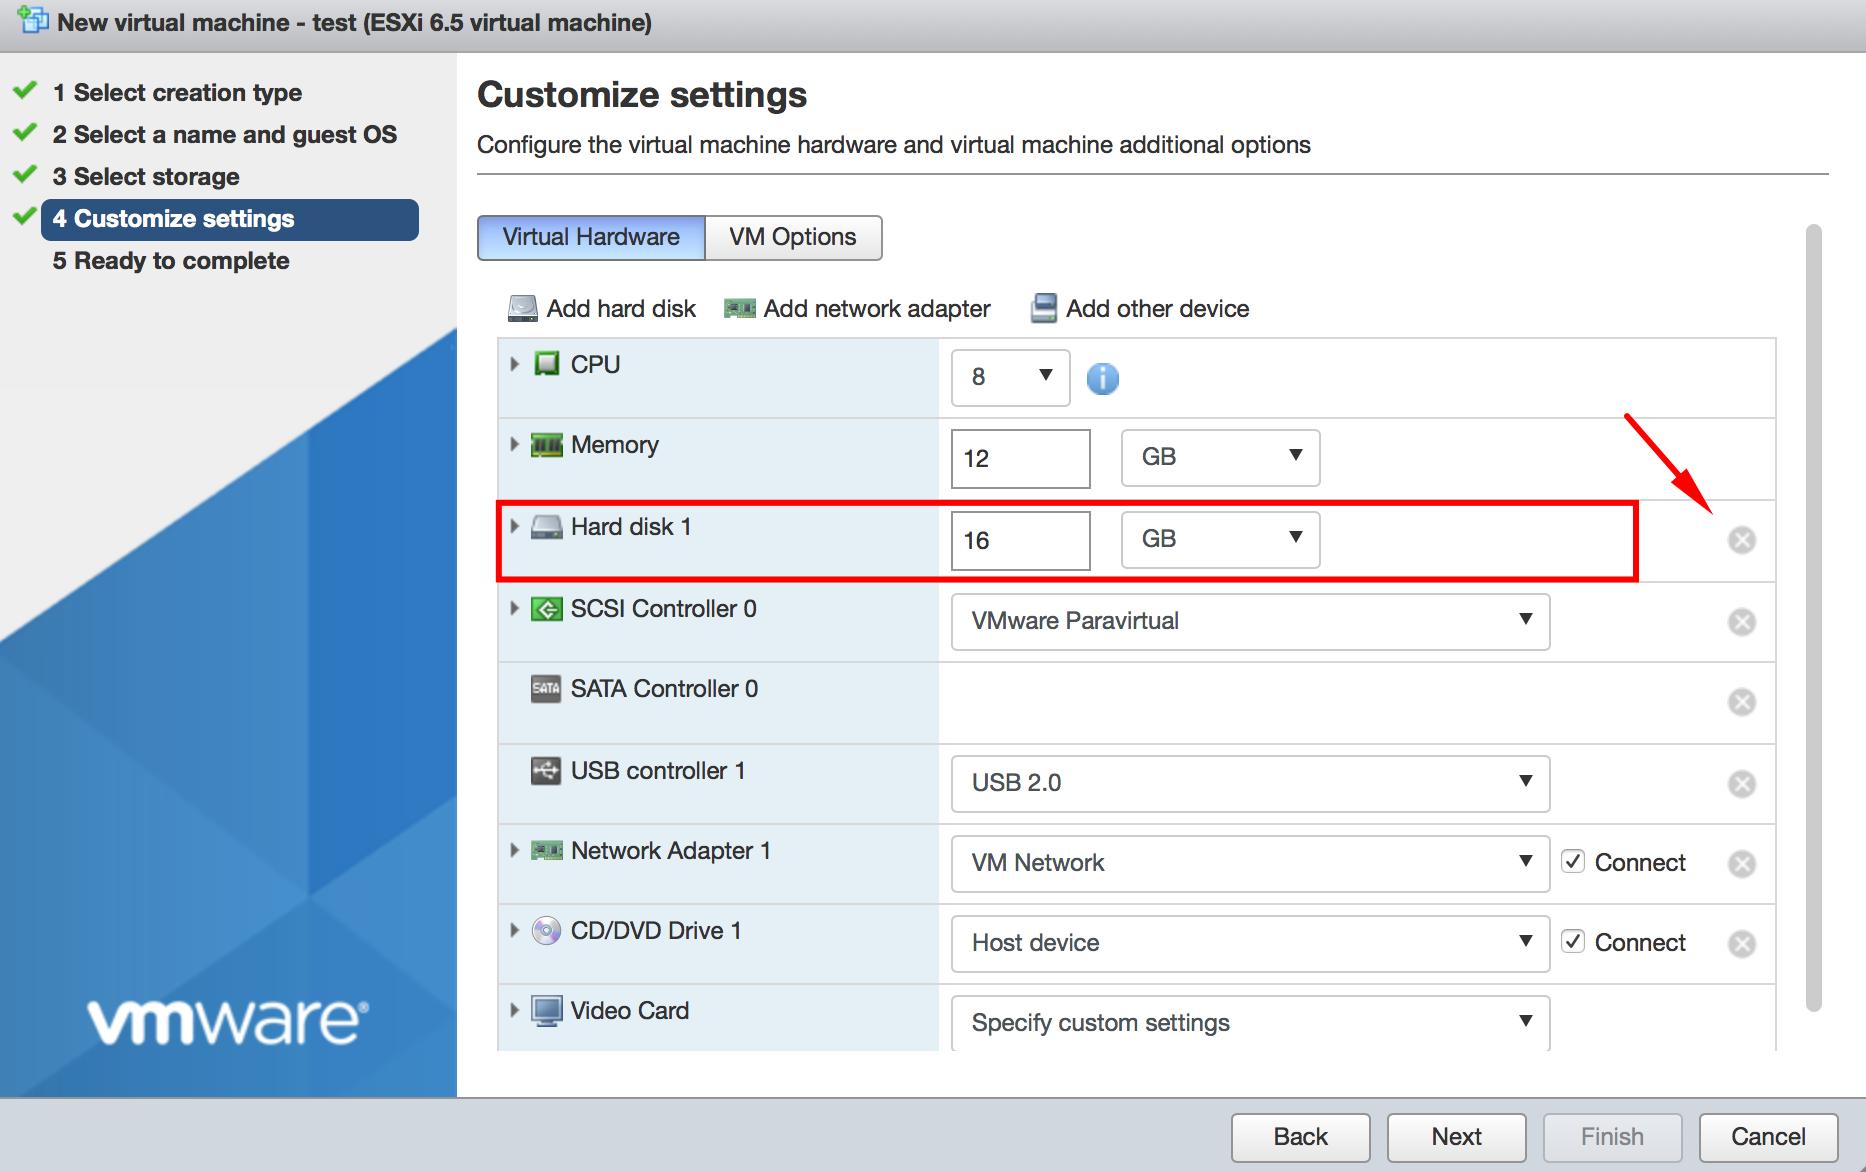 Customize settings 1